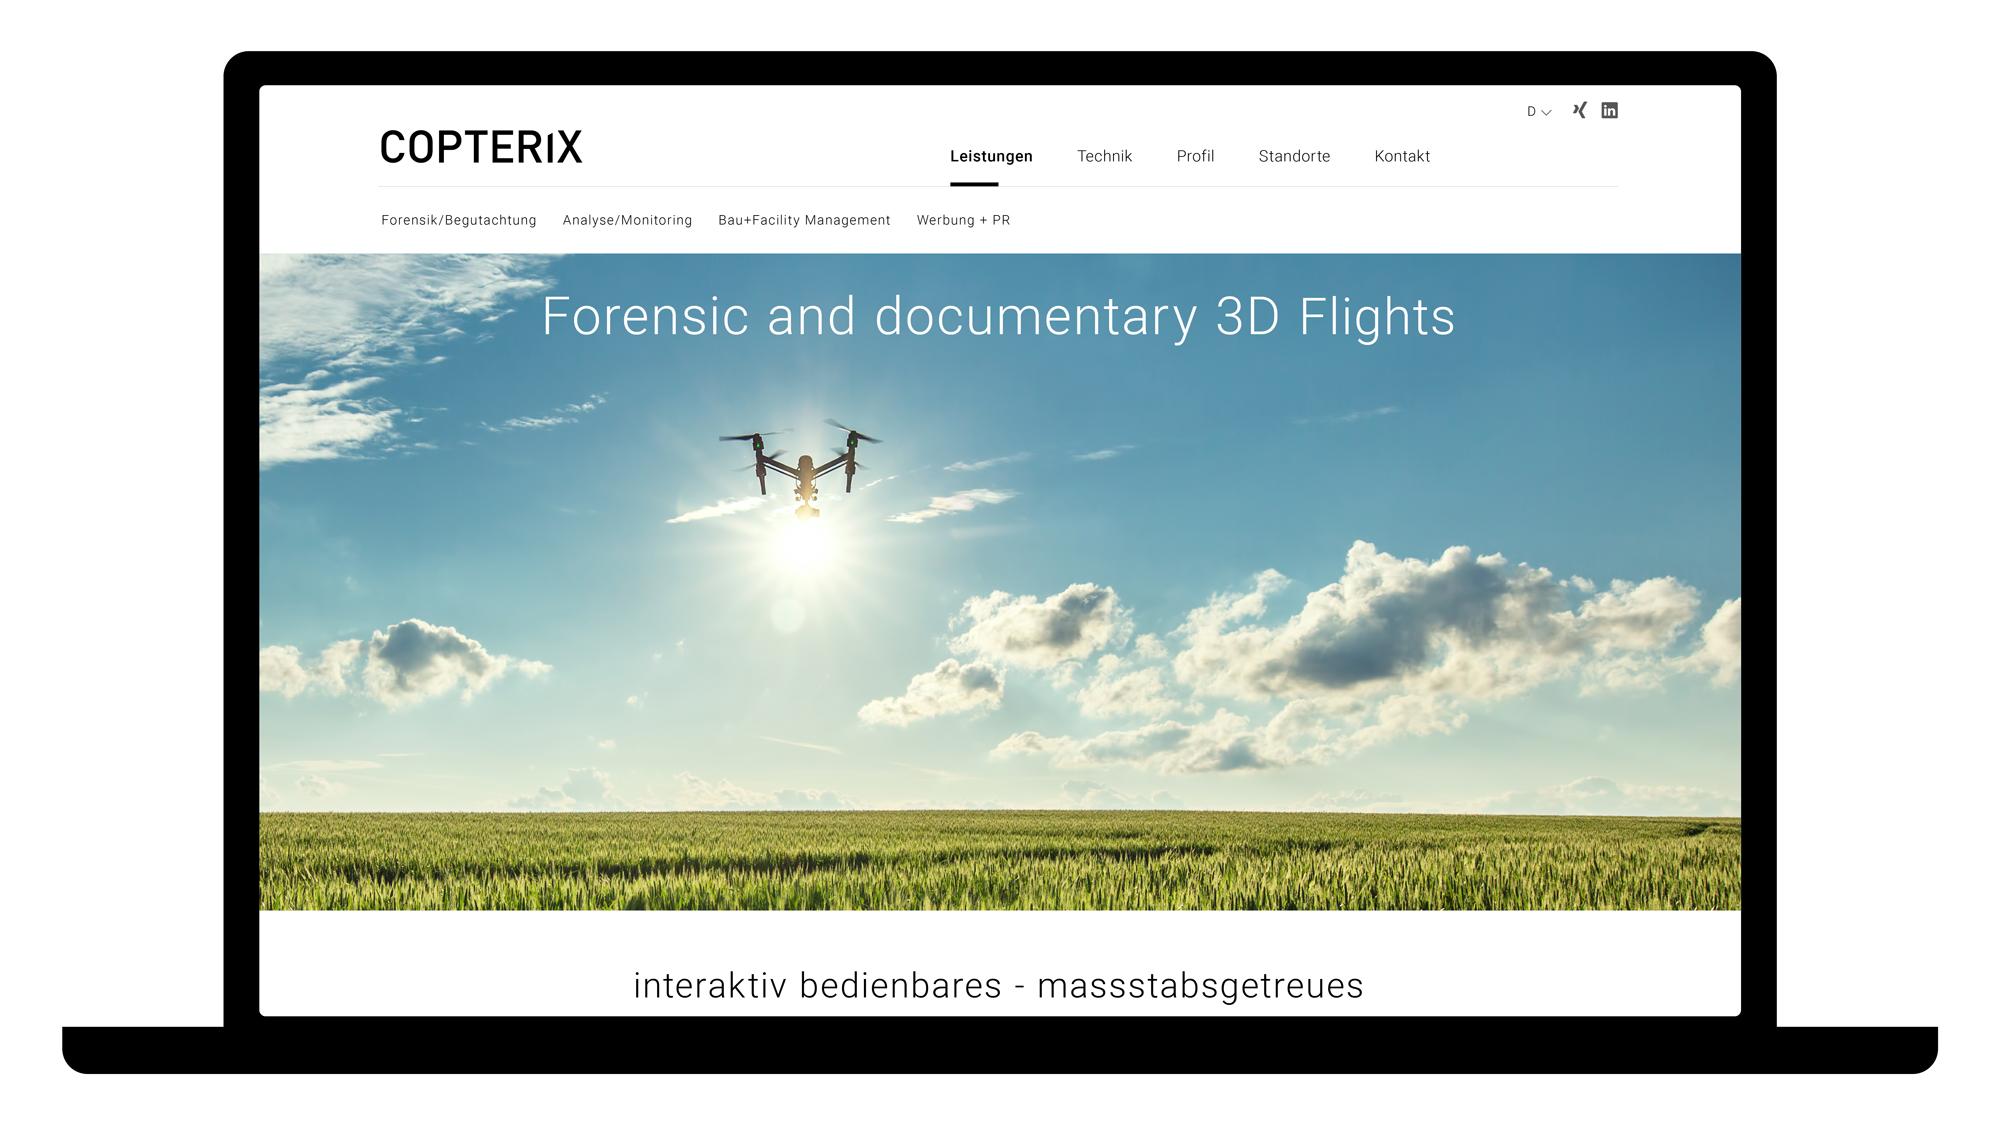 planx-website-design-copterix